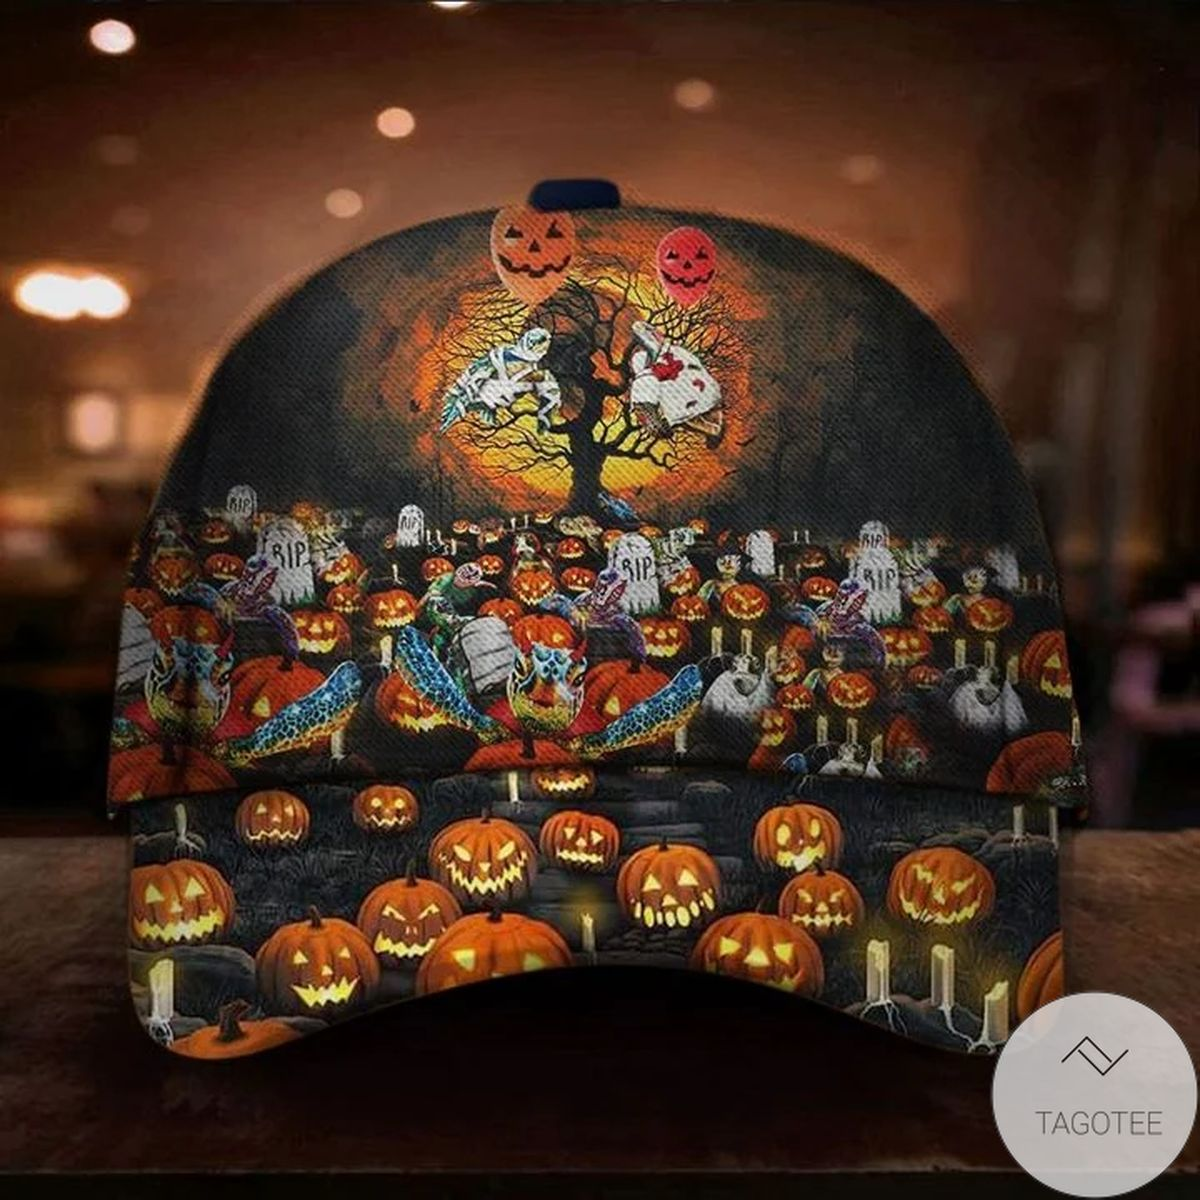 Turtle Pumpkin Halloween Hat Unique Halloween Merchandise Themed Gift For Adults